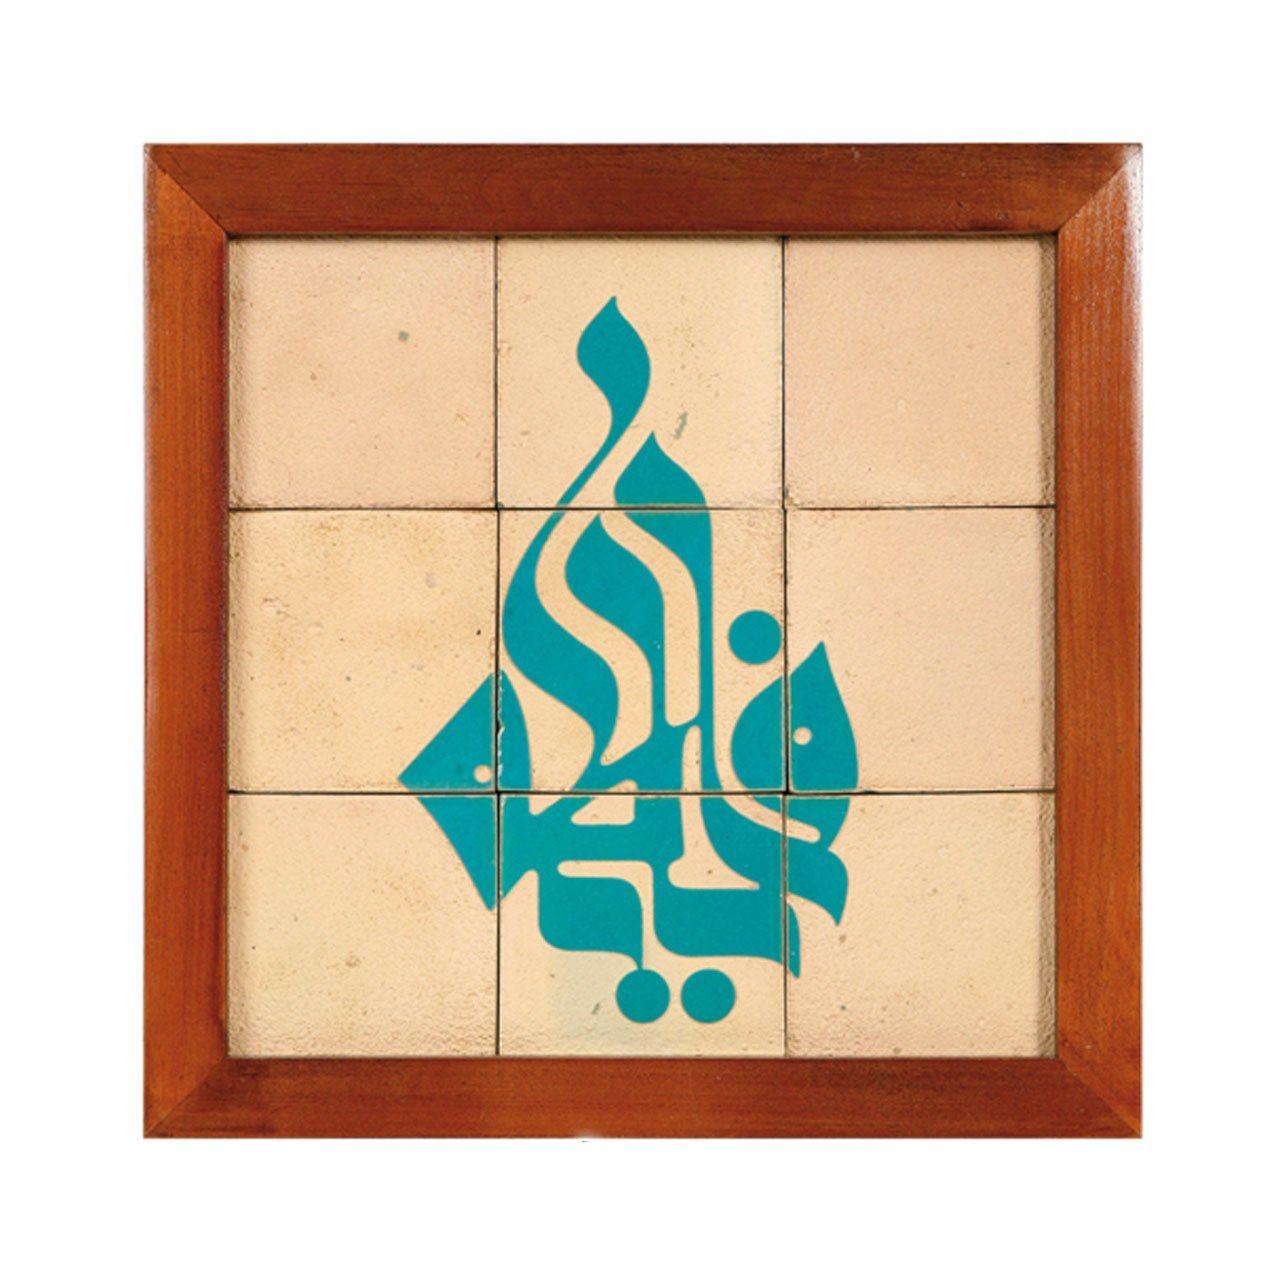 تابلو کاشی سلام مجموعه جلایا فاطمه سلام الله علیها 9 تکه